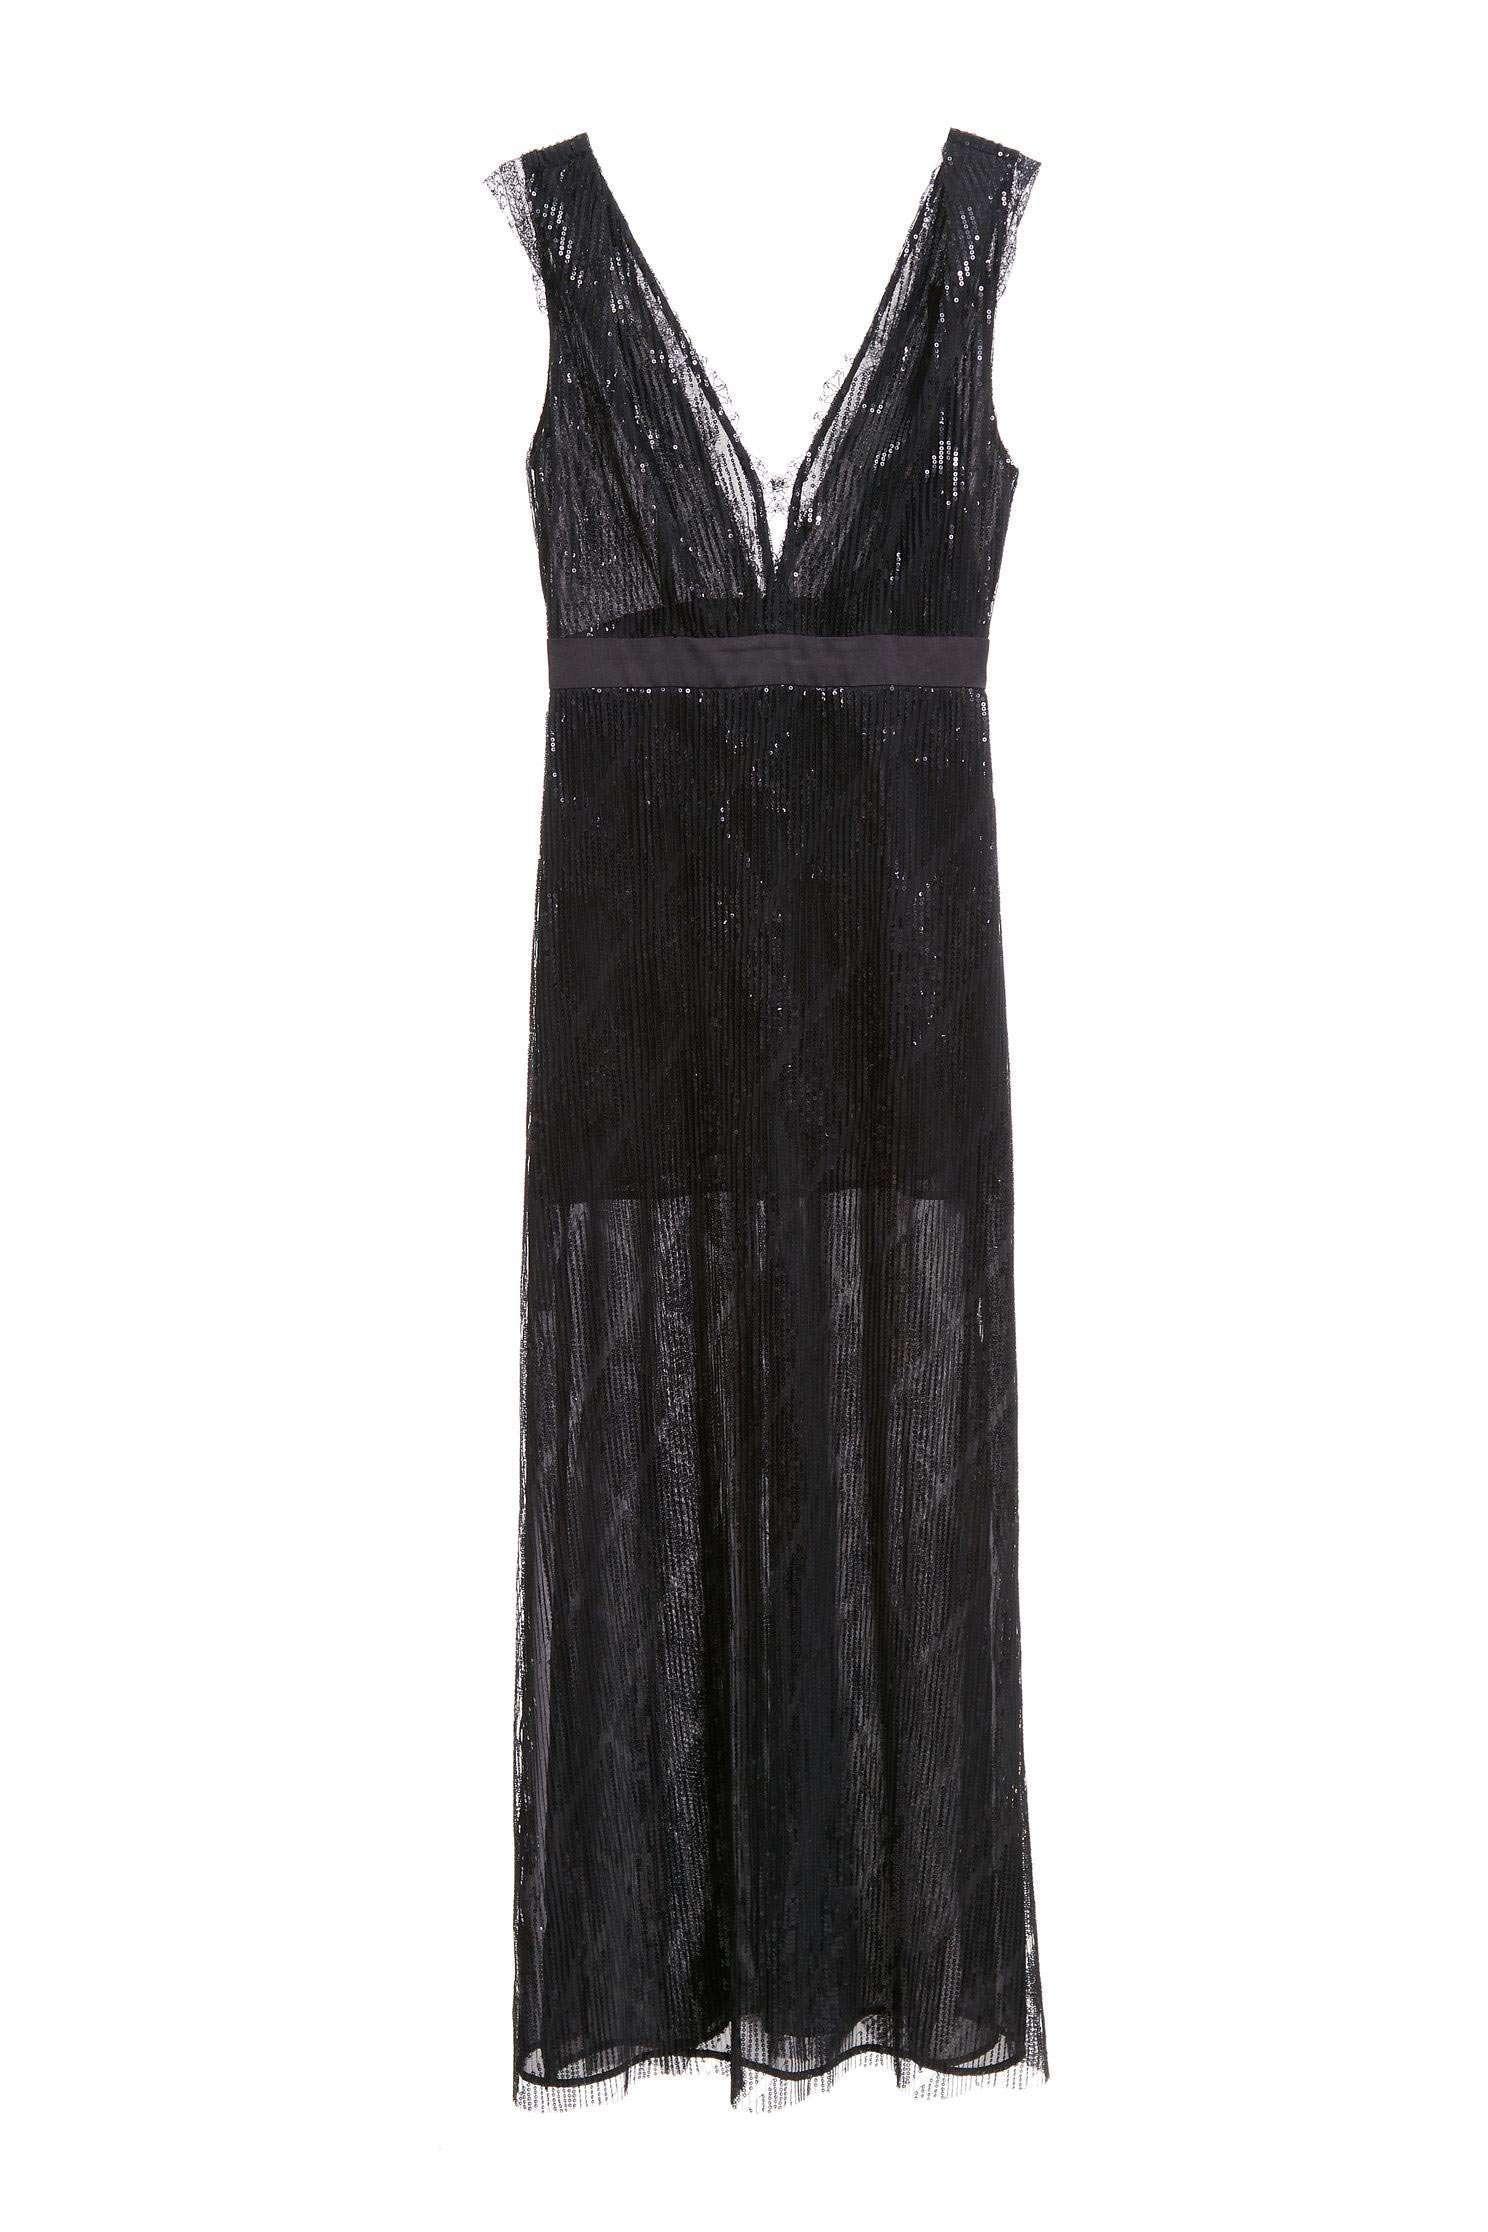 Black sequinlace gown,V-neck dress,Cocktail Dress,無袖洋裝,Evening Wear,Lace,Lace Dress,Long dress,Black dress